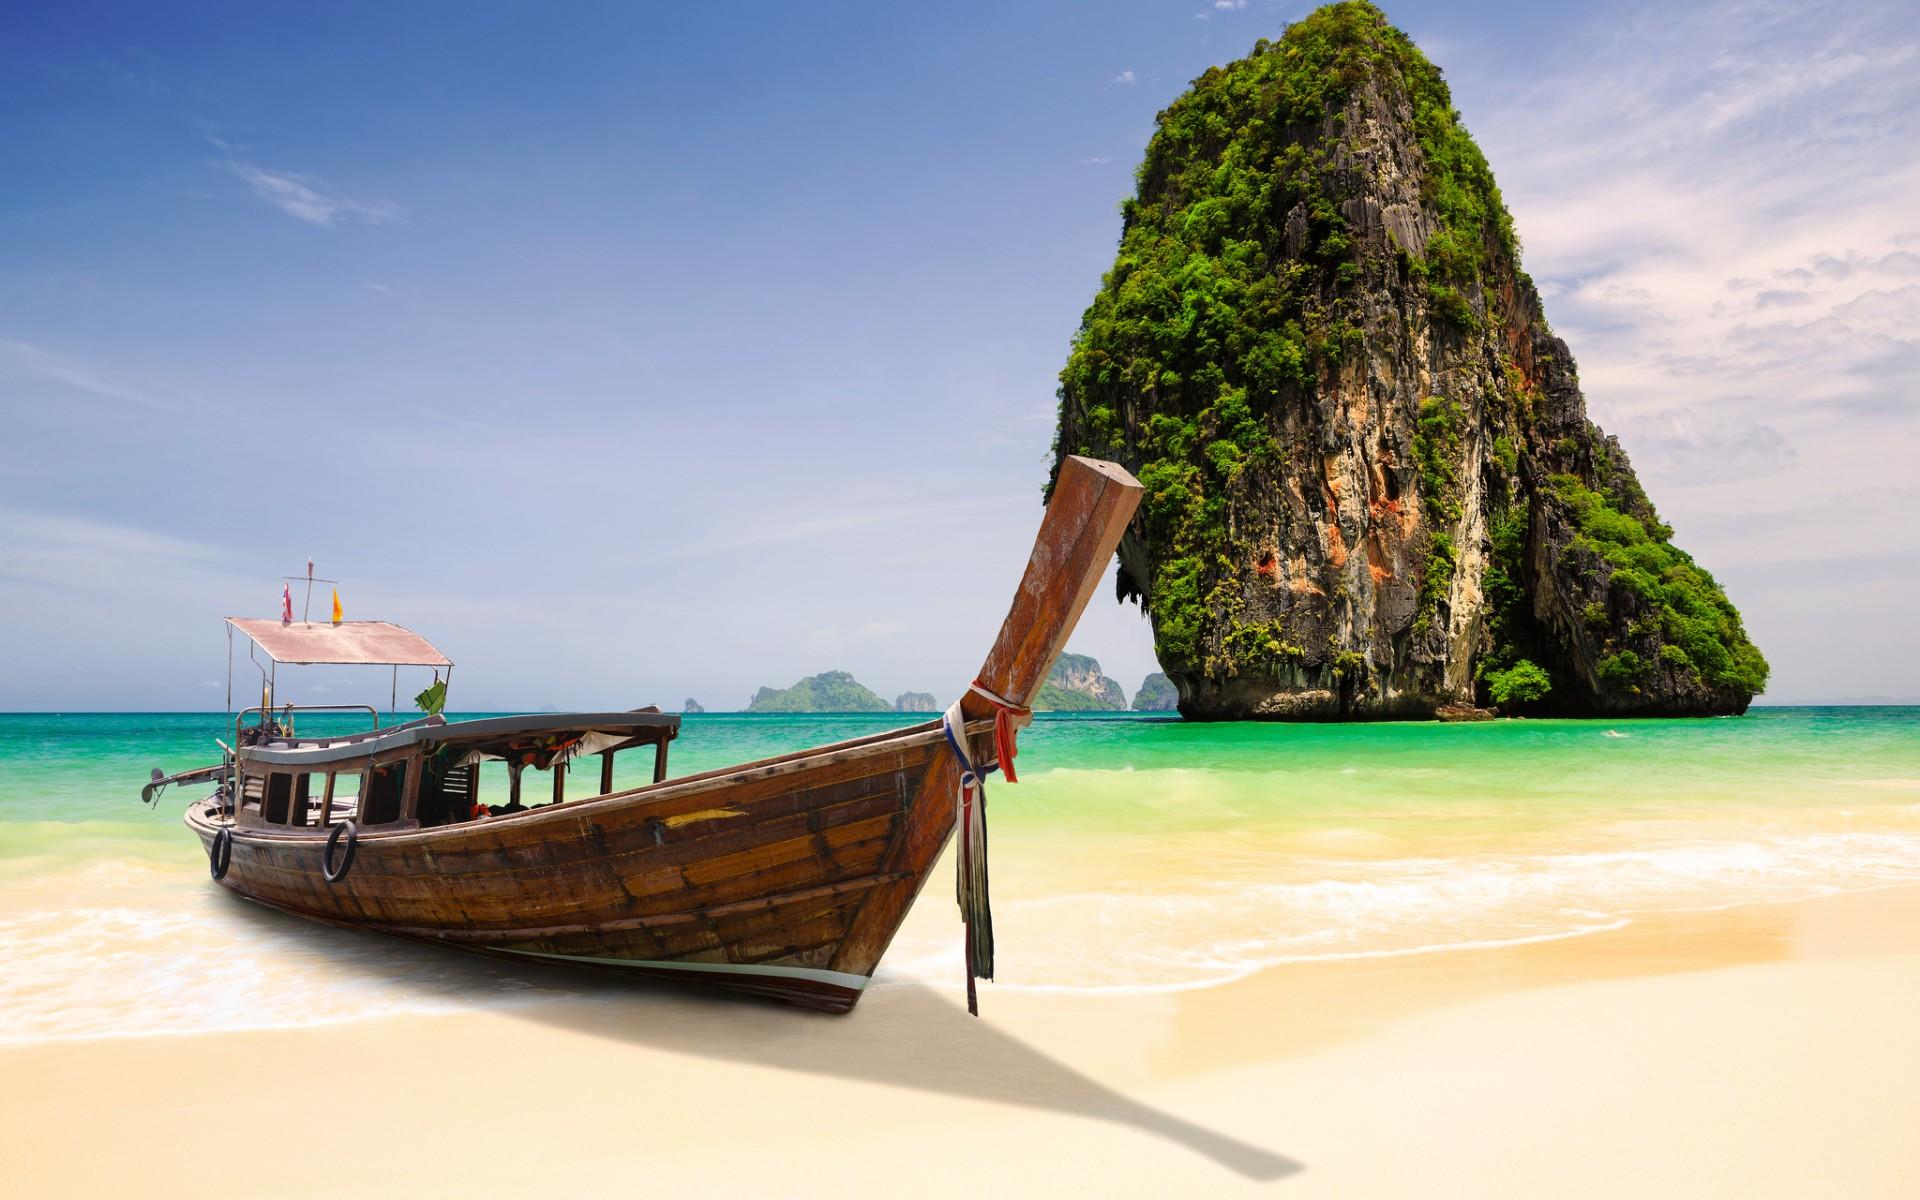 QR krabi new route